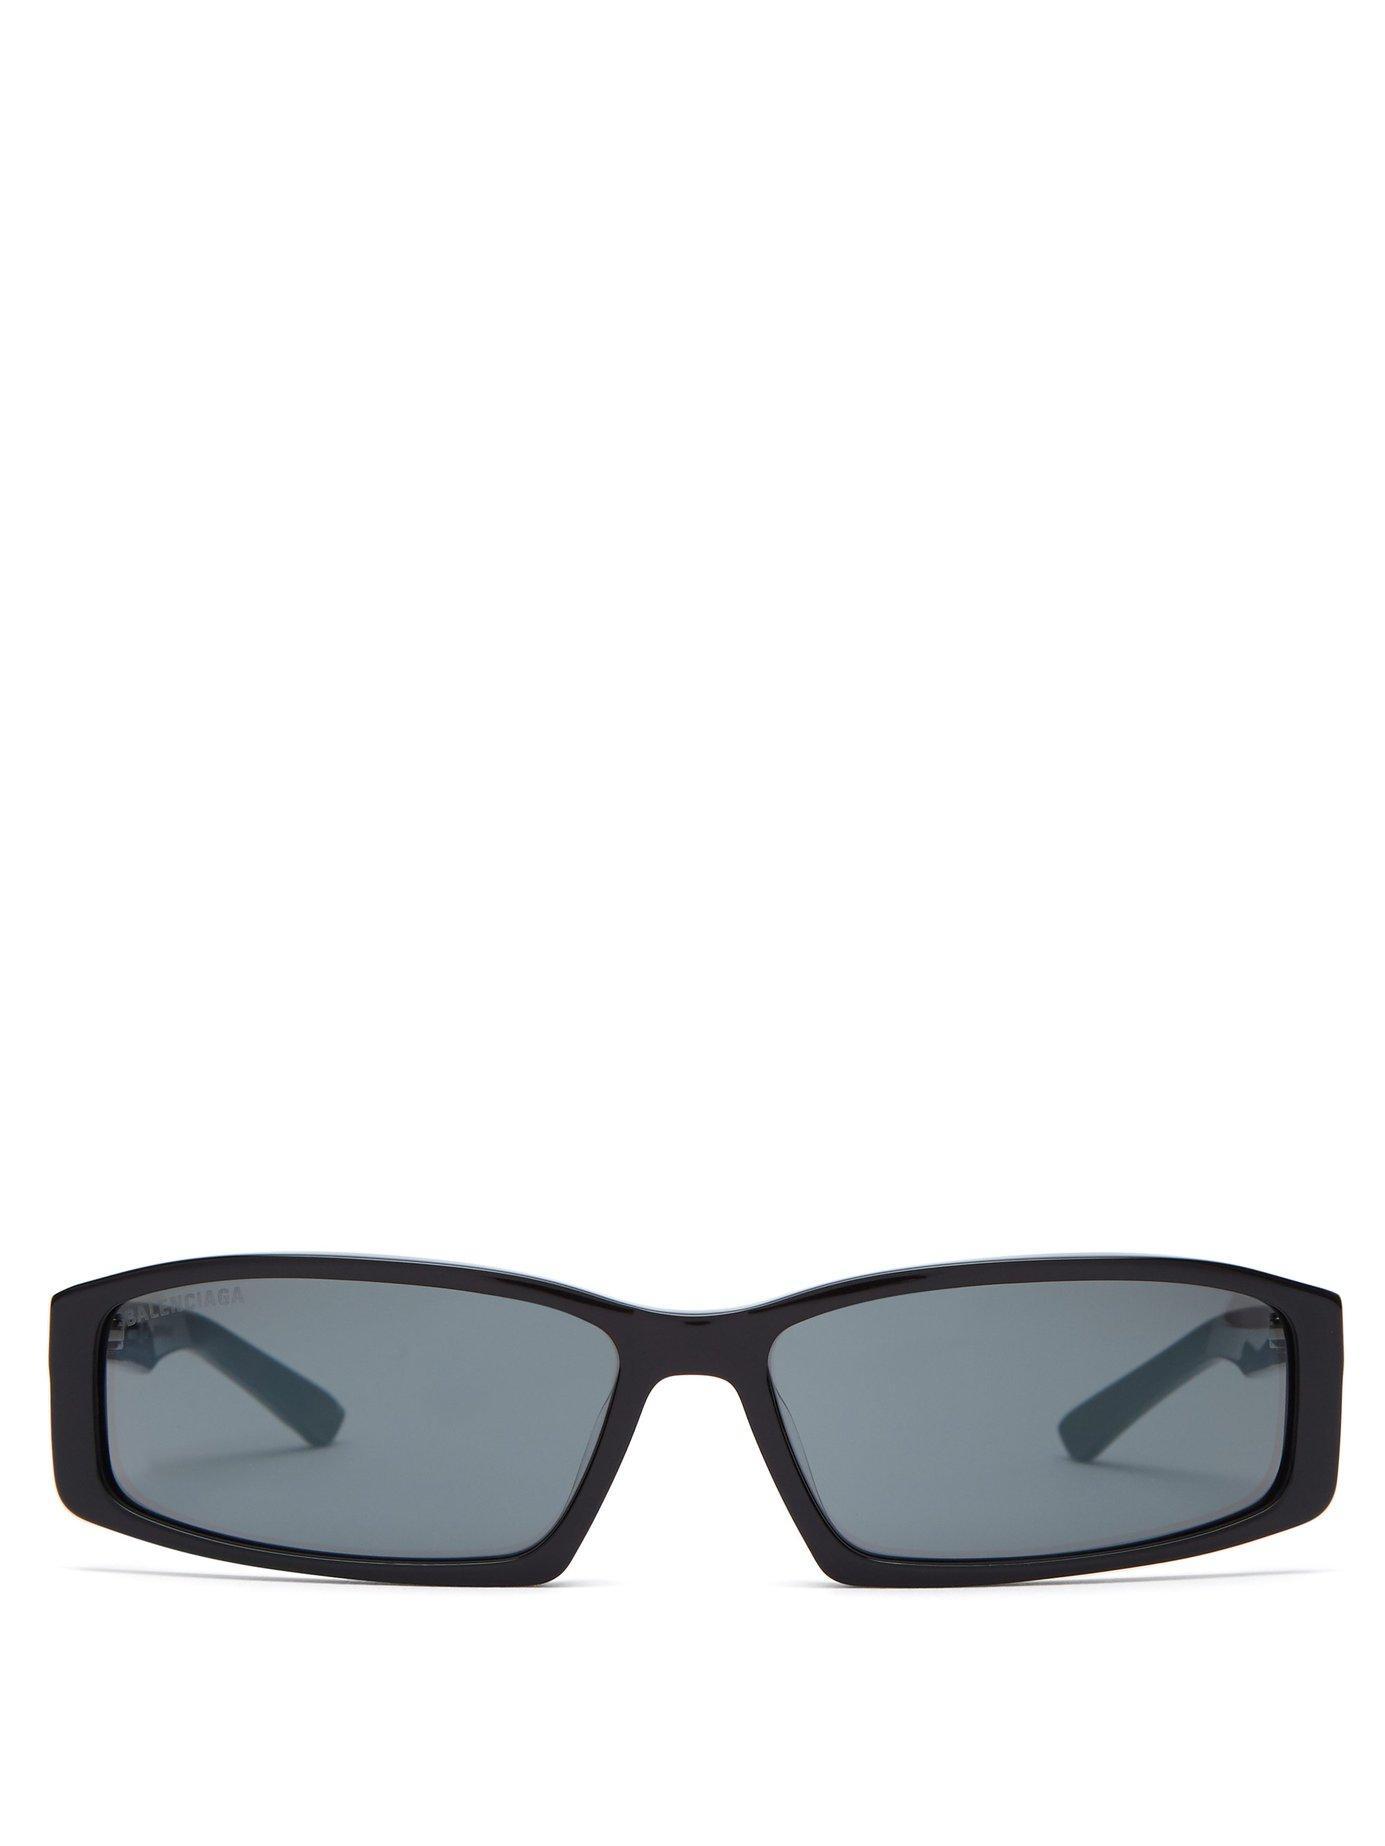 24c23116126 Lyst - Balenciaga Neo Rectangle Frame Acetate Sunglasses in Black ...